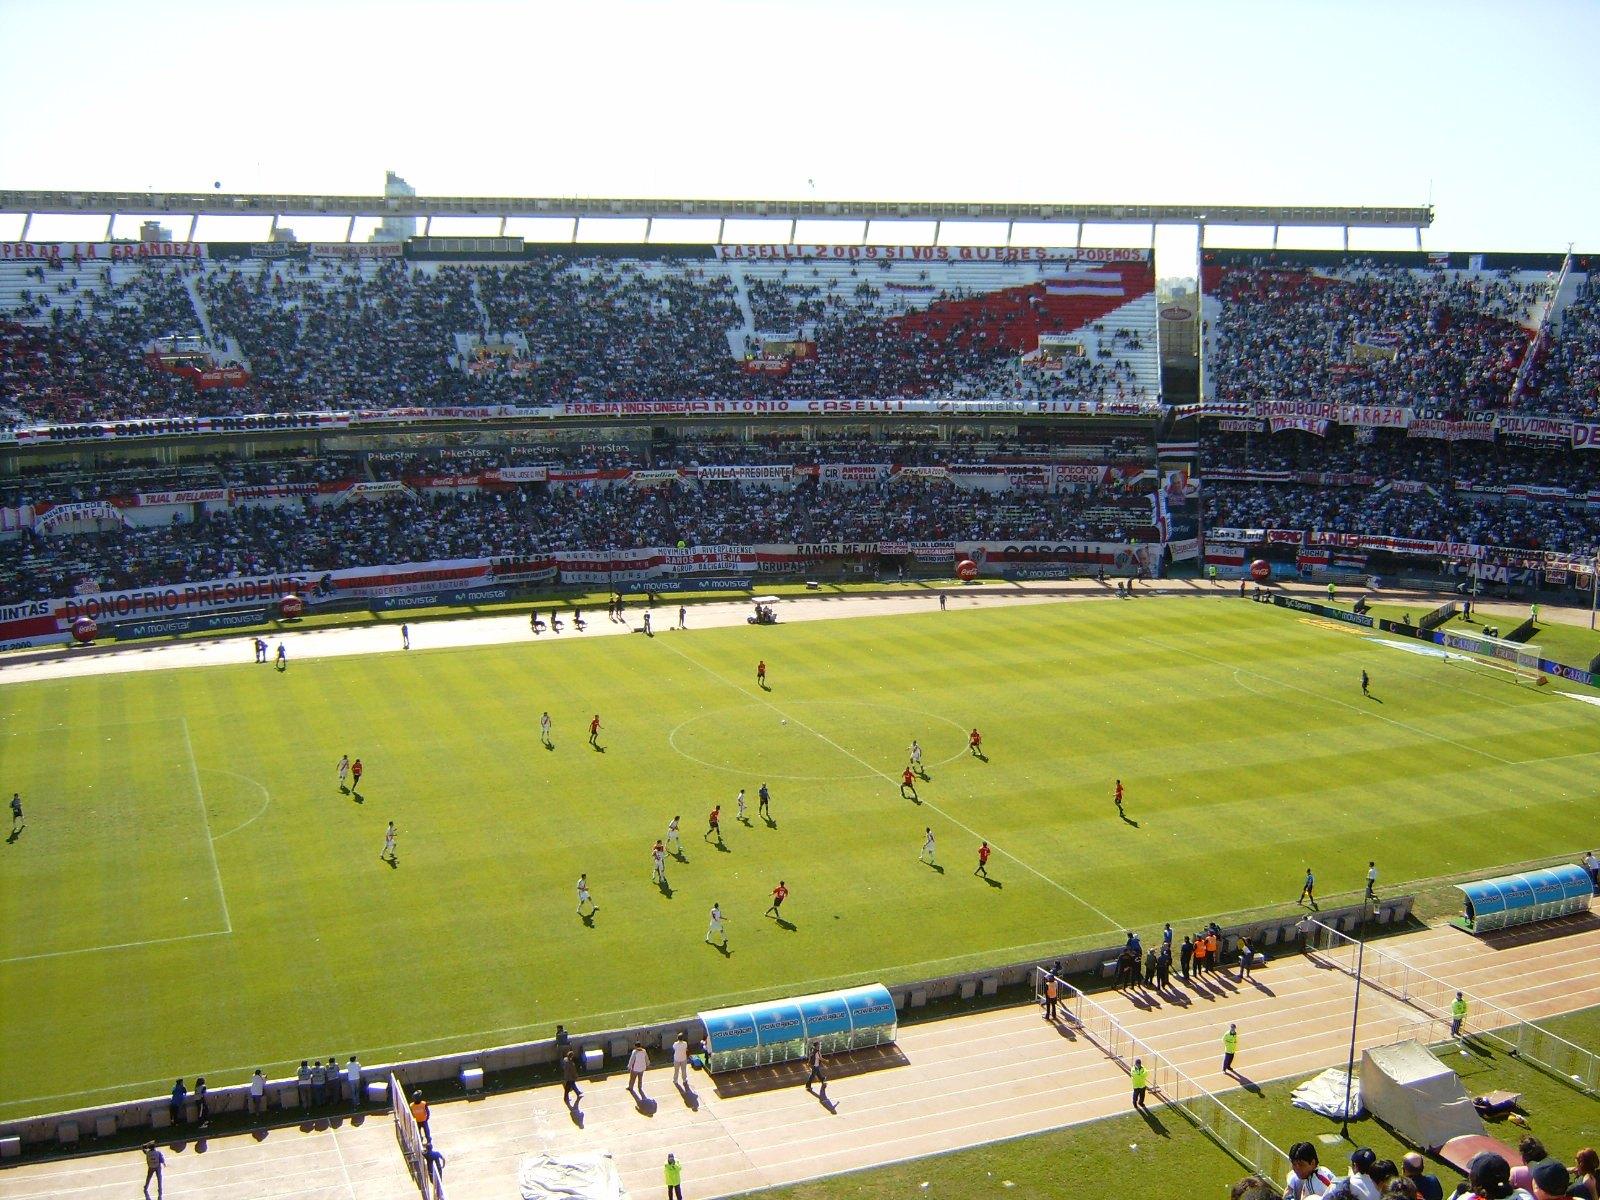 River Plate: River Plate Stadium